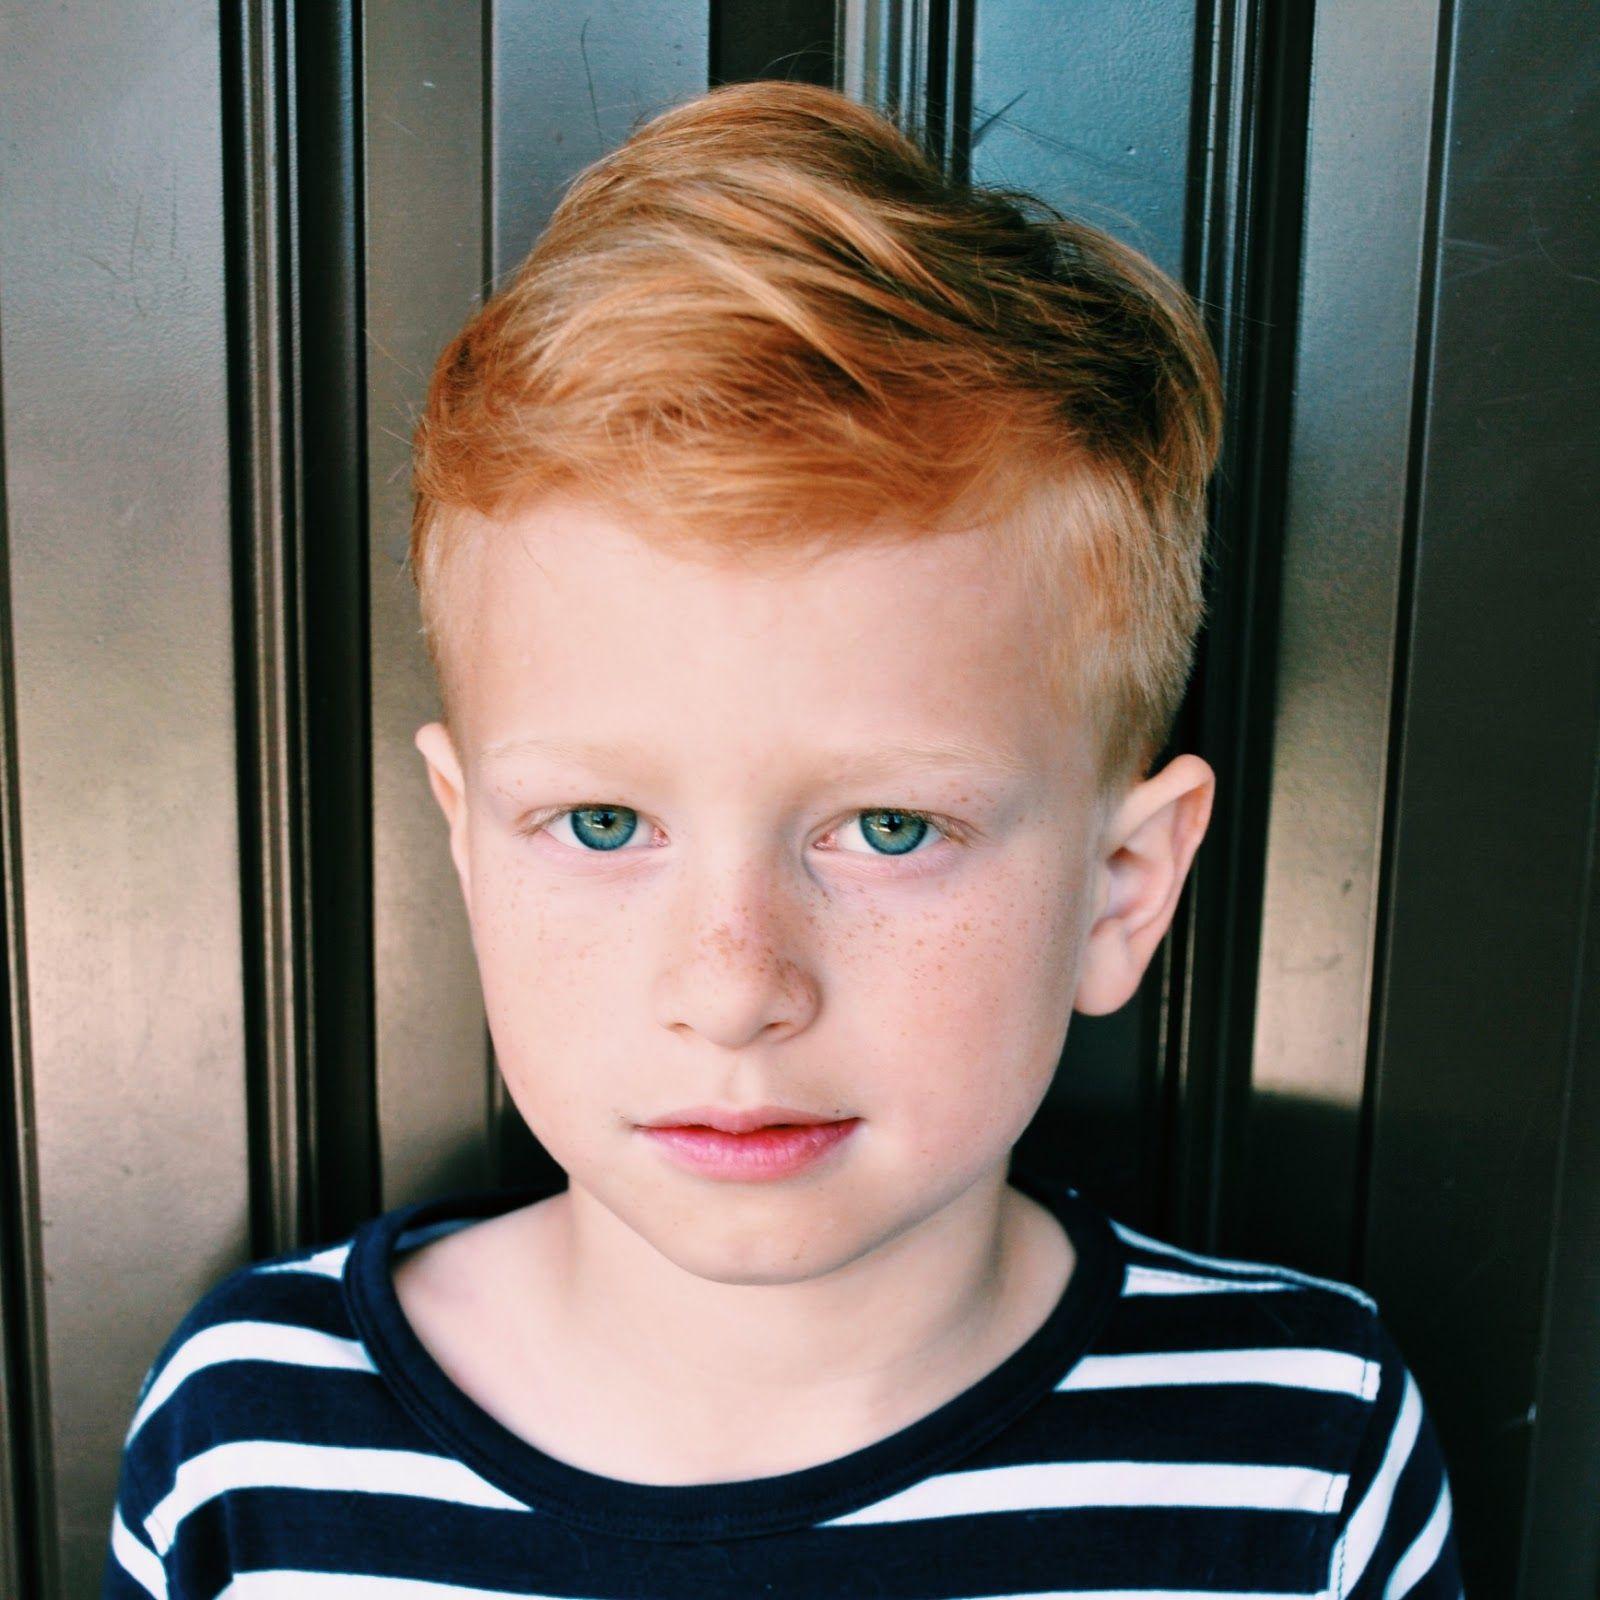 Best ideas about Boy Undercut Hairstyle . Save or Pin Best 25 Boys undercut ideas on Pinterest Now.